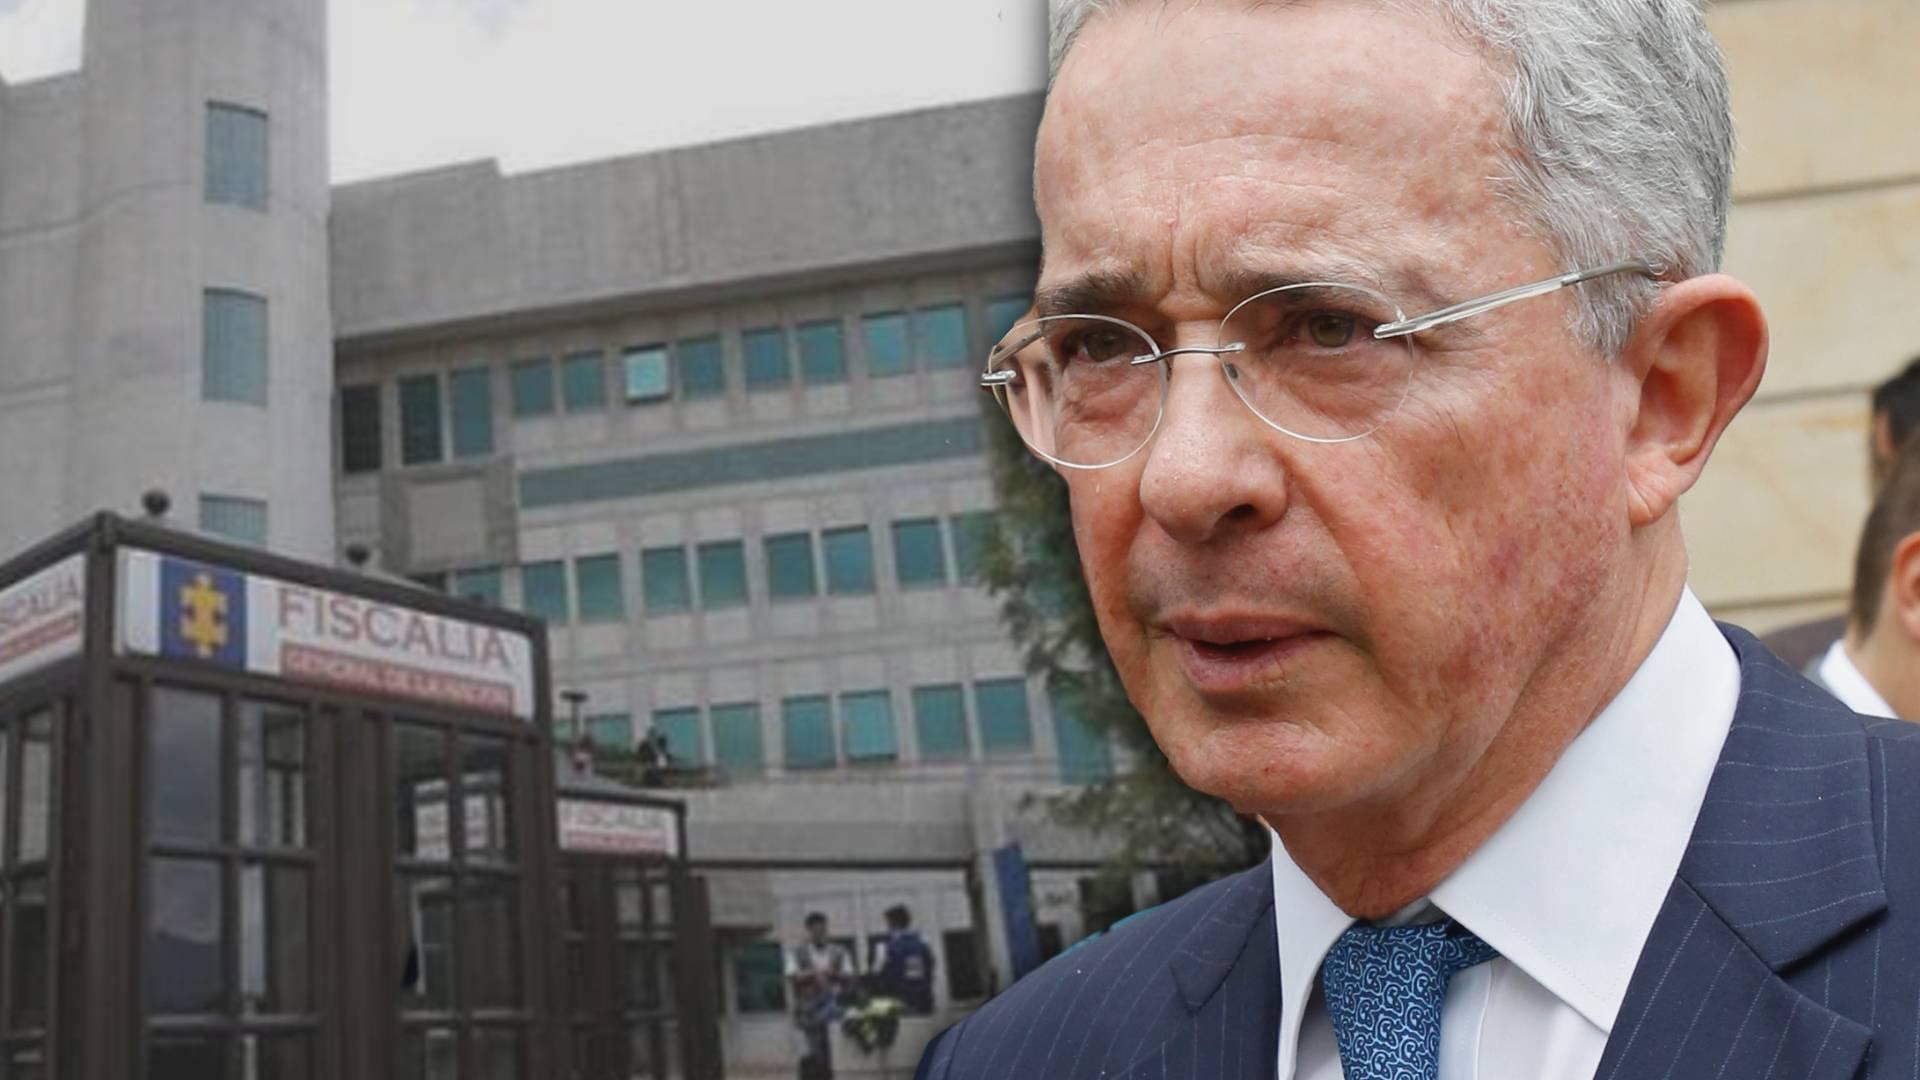 Alvaro Uribe + Fiscalia